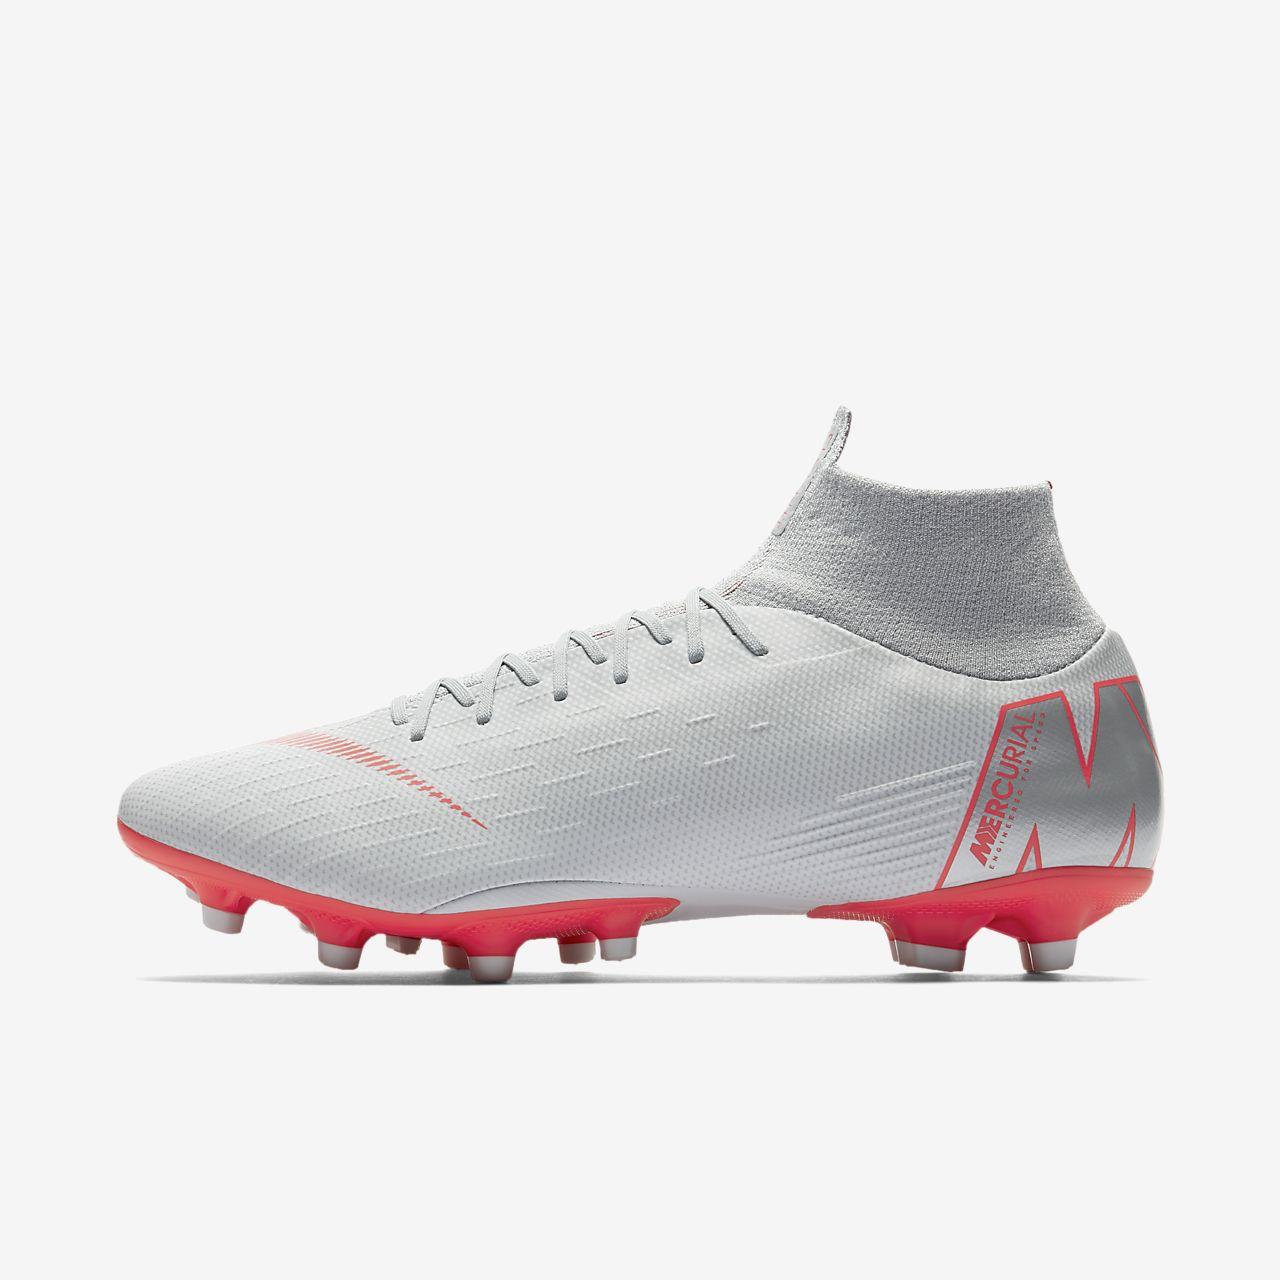 Nike Mercurial Superfly VI Pro AG PRO Botas de fútbol para césped artificial